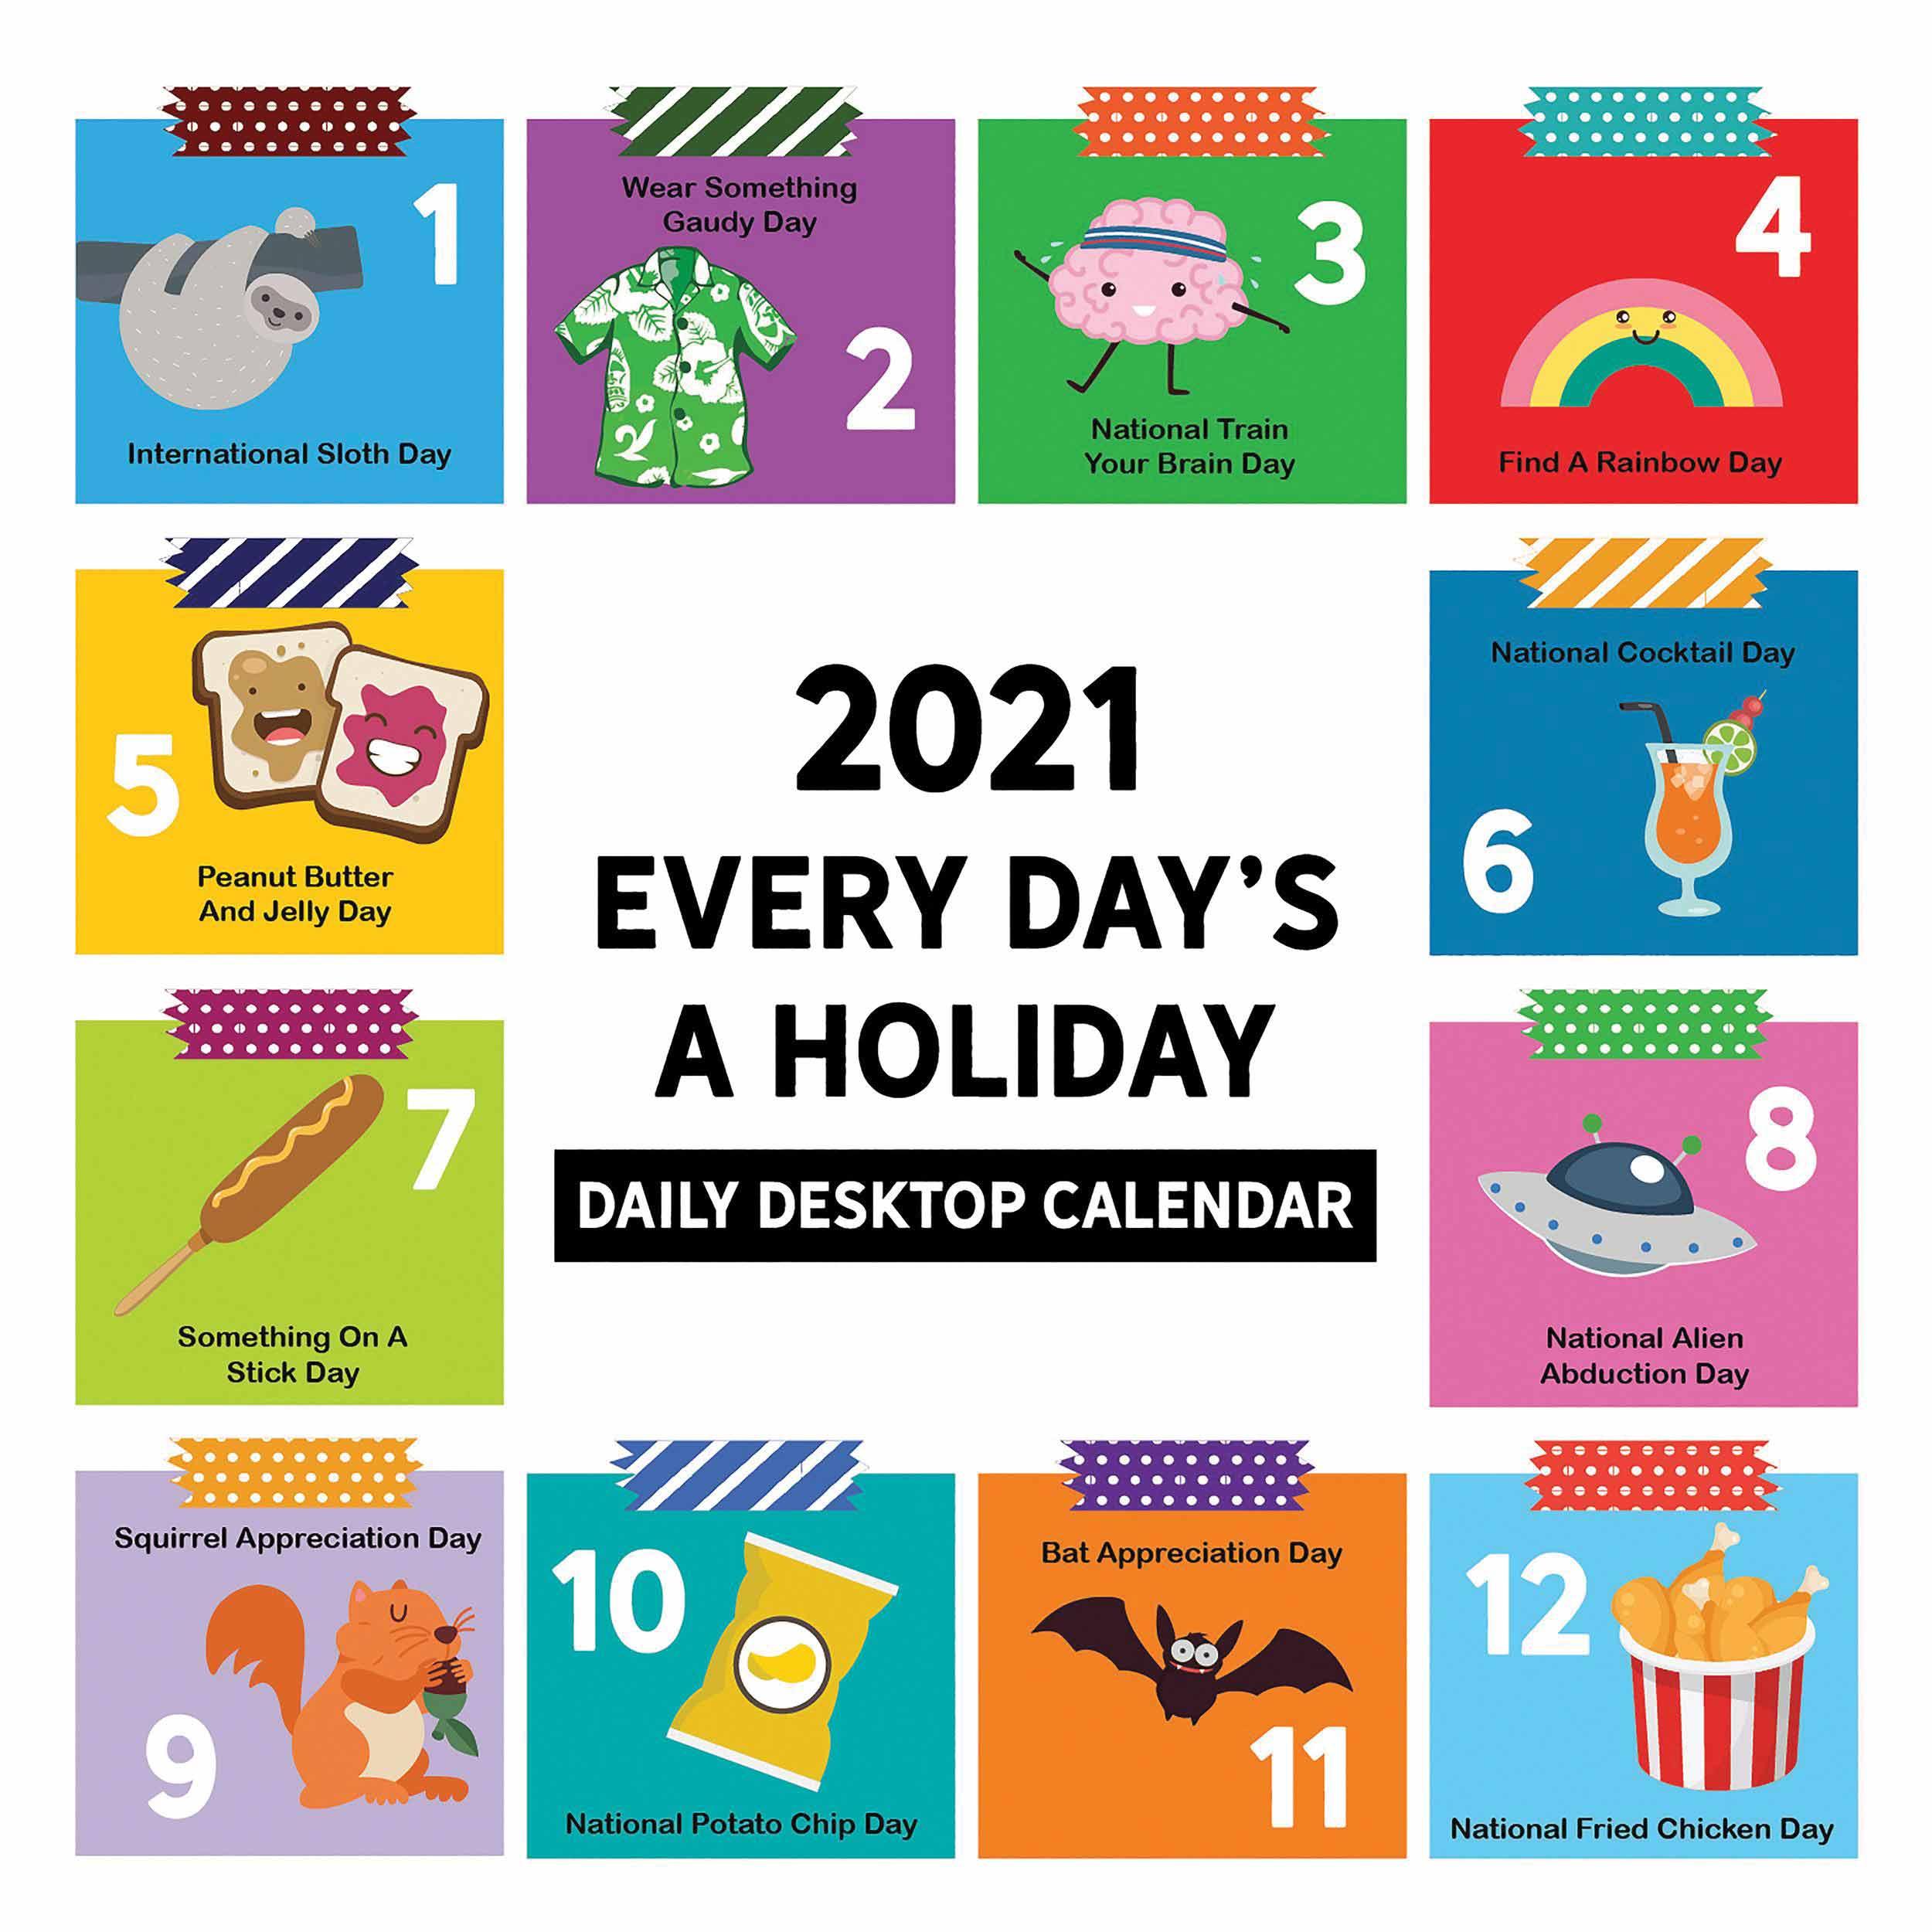 Every Day'S A Holiday Desk Calendar 2021 At Calendar Club